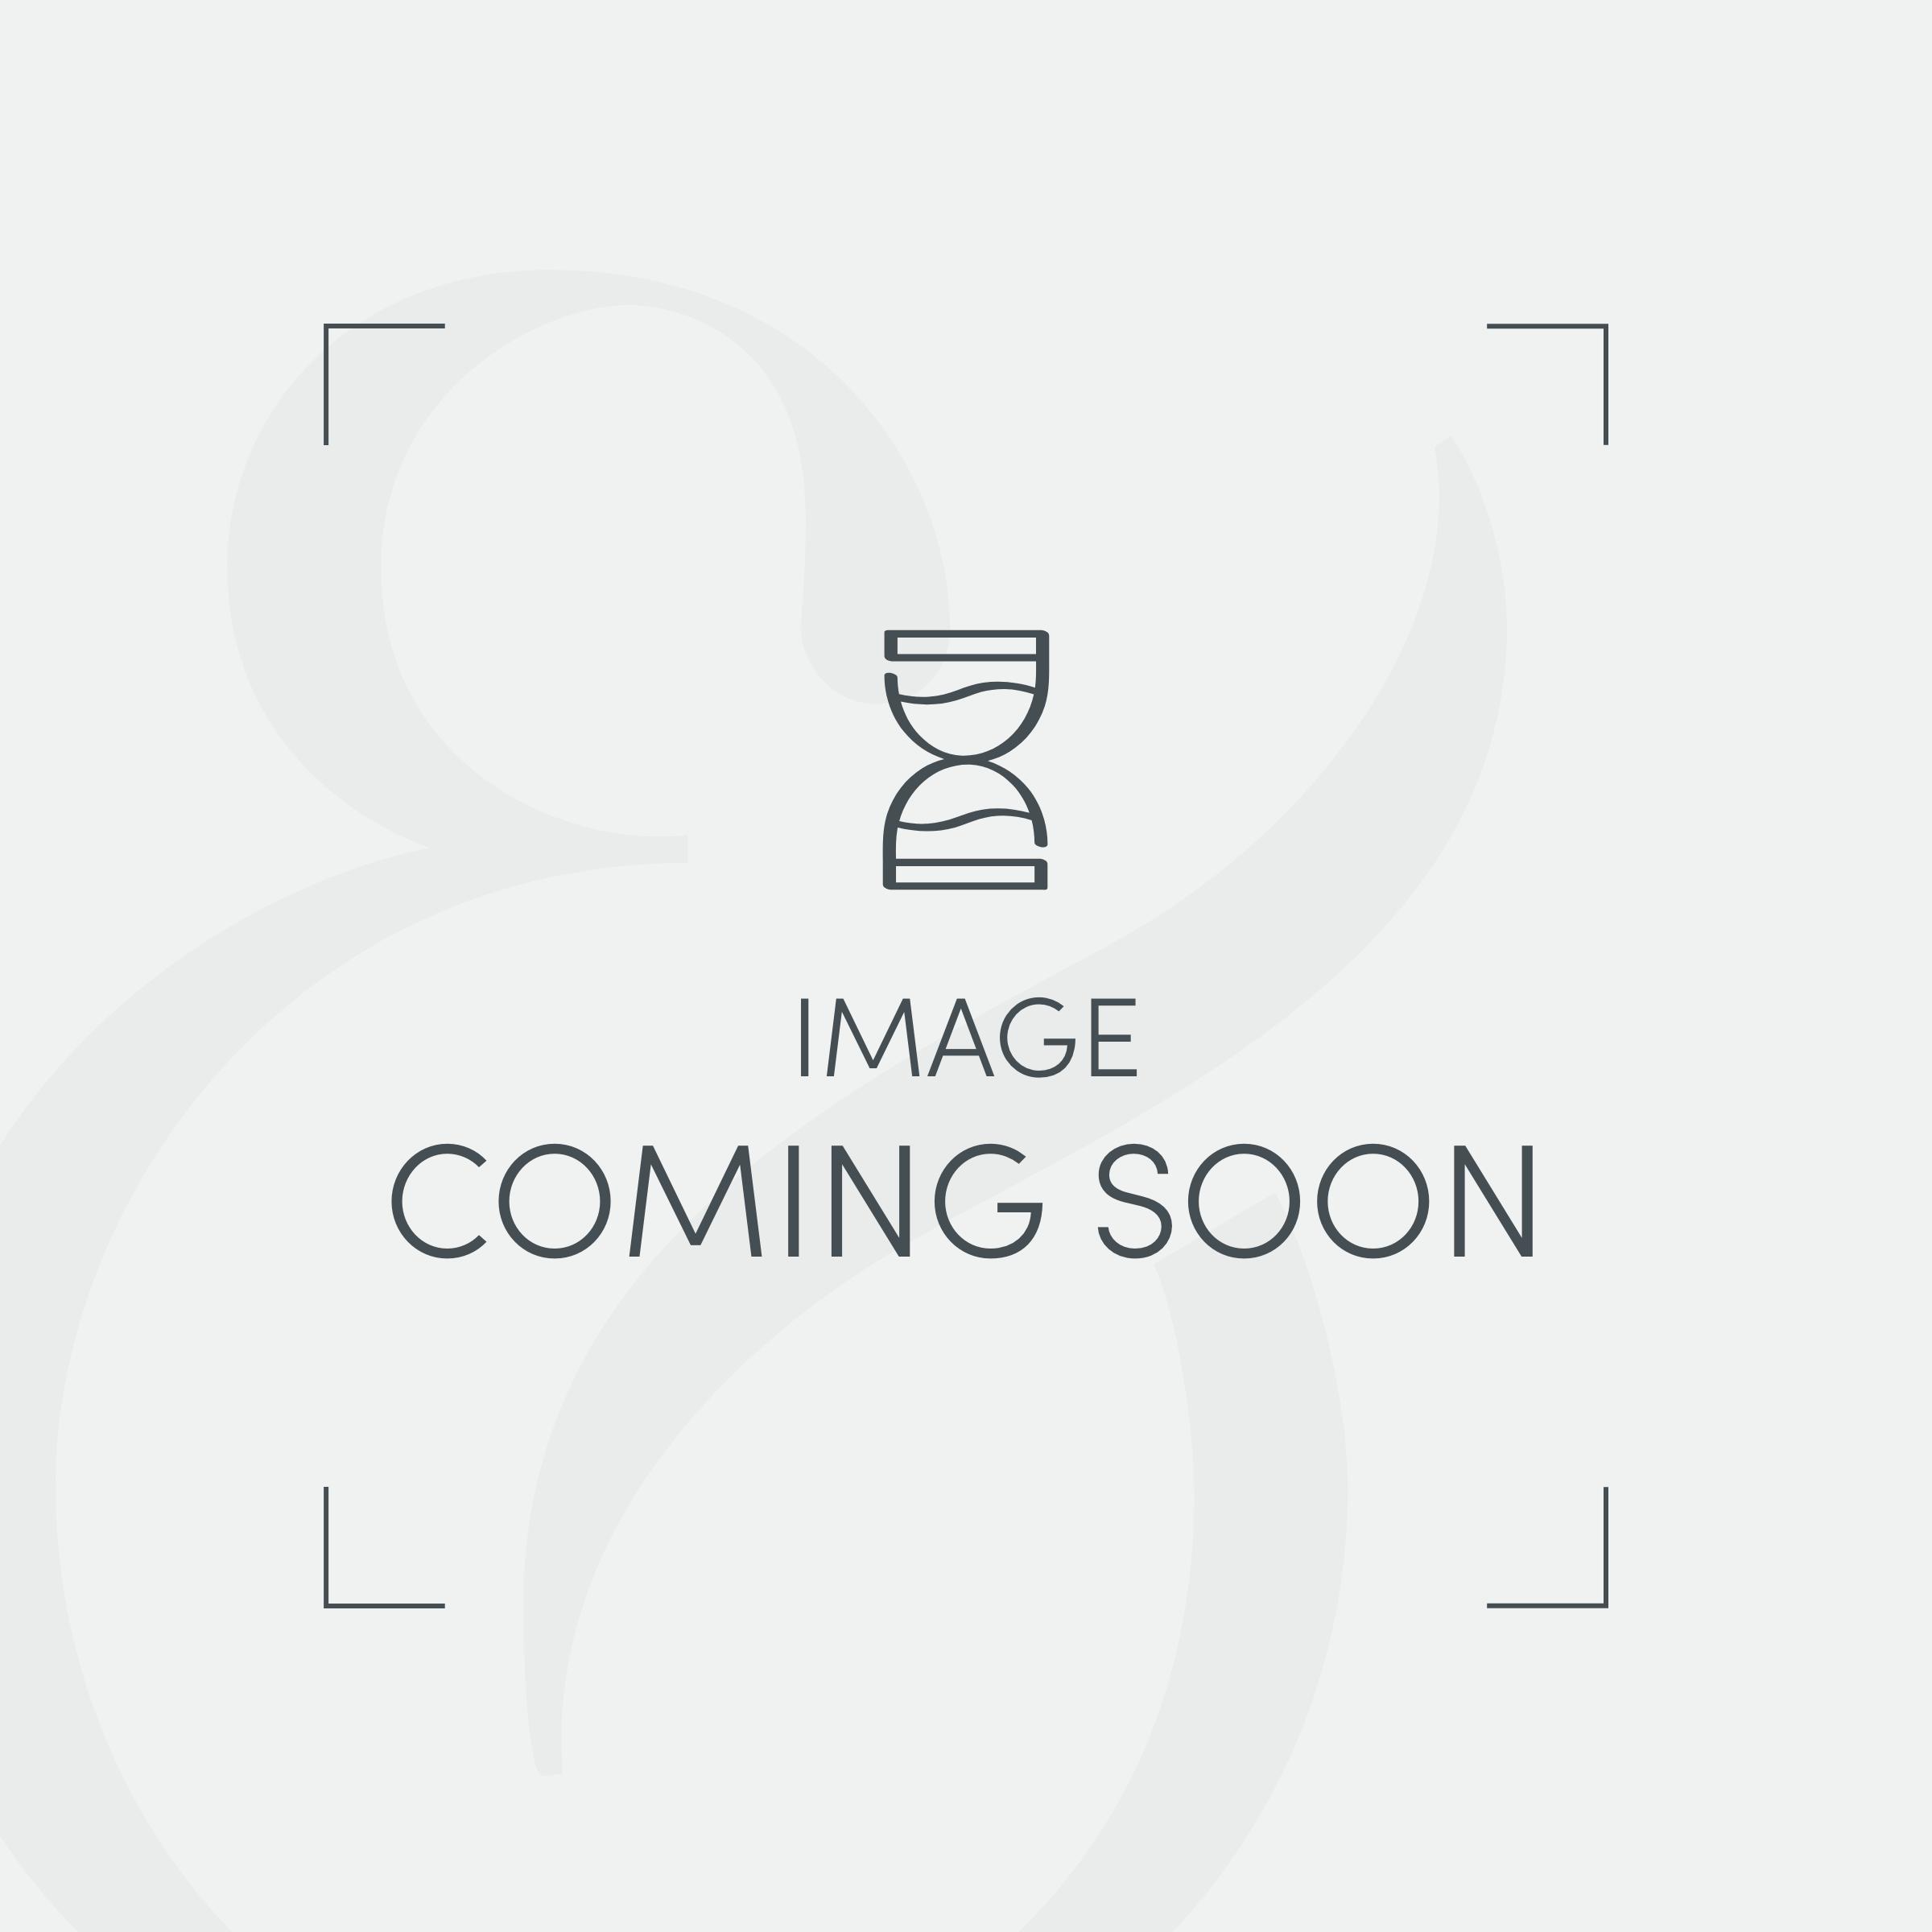 Micro-Stripe Seersucker - 2 x Standard Housewife Pillowcases - White